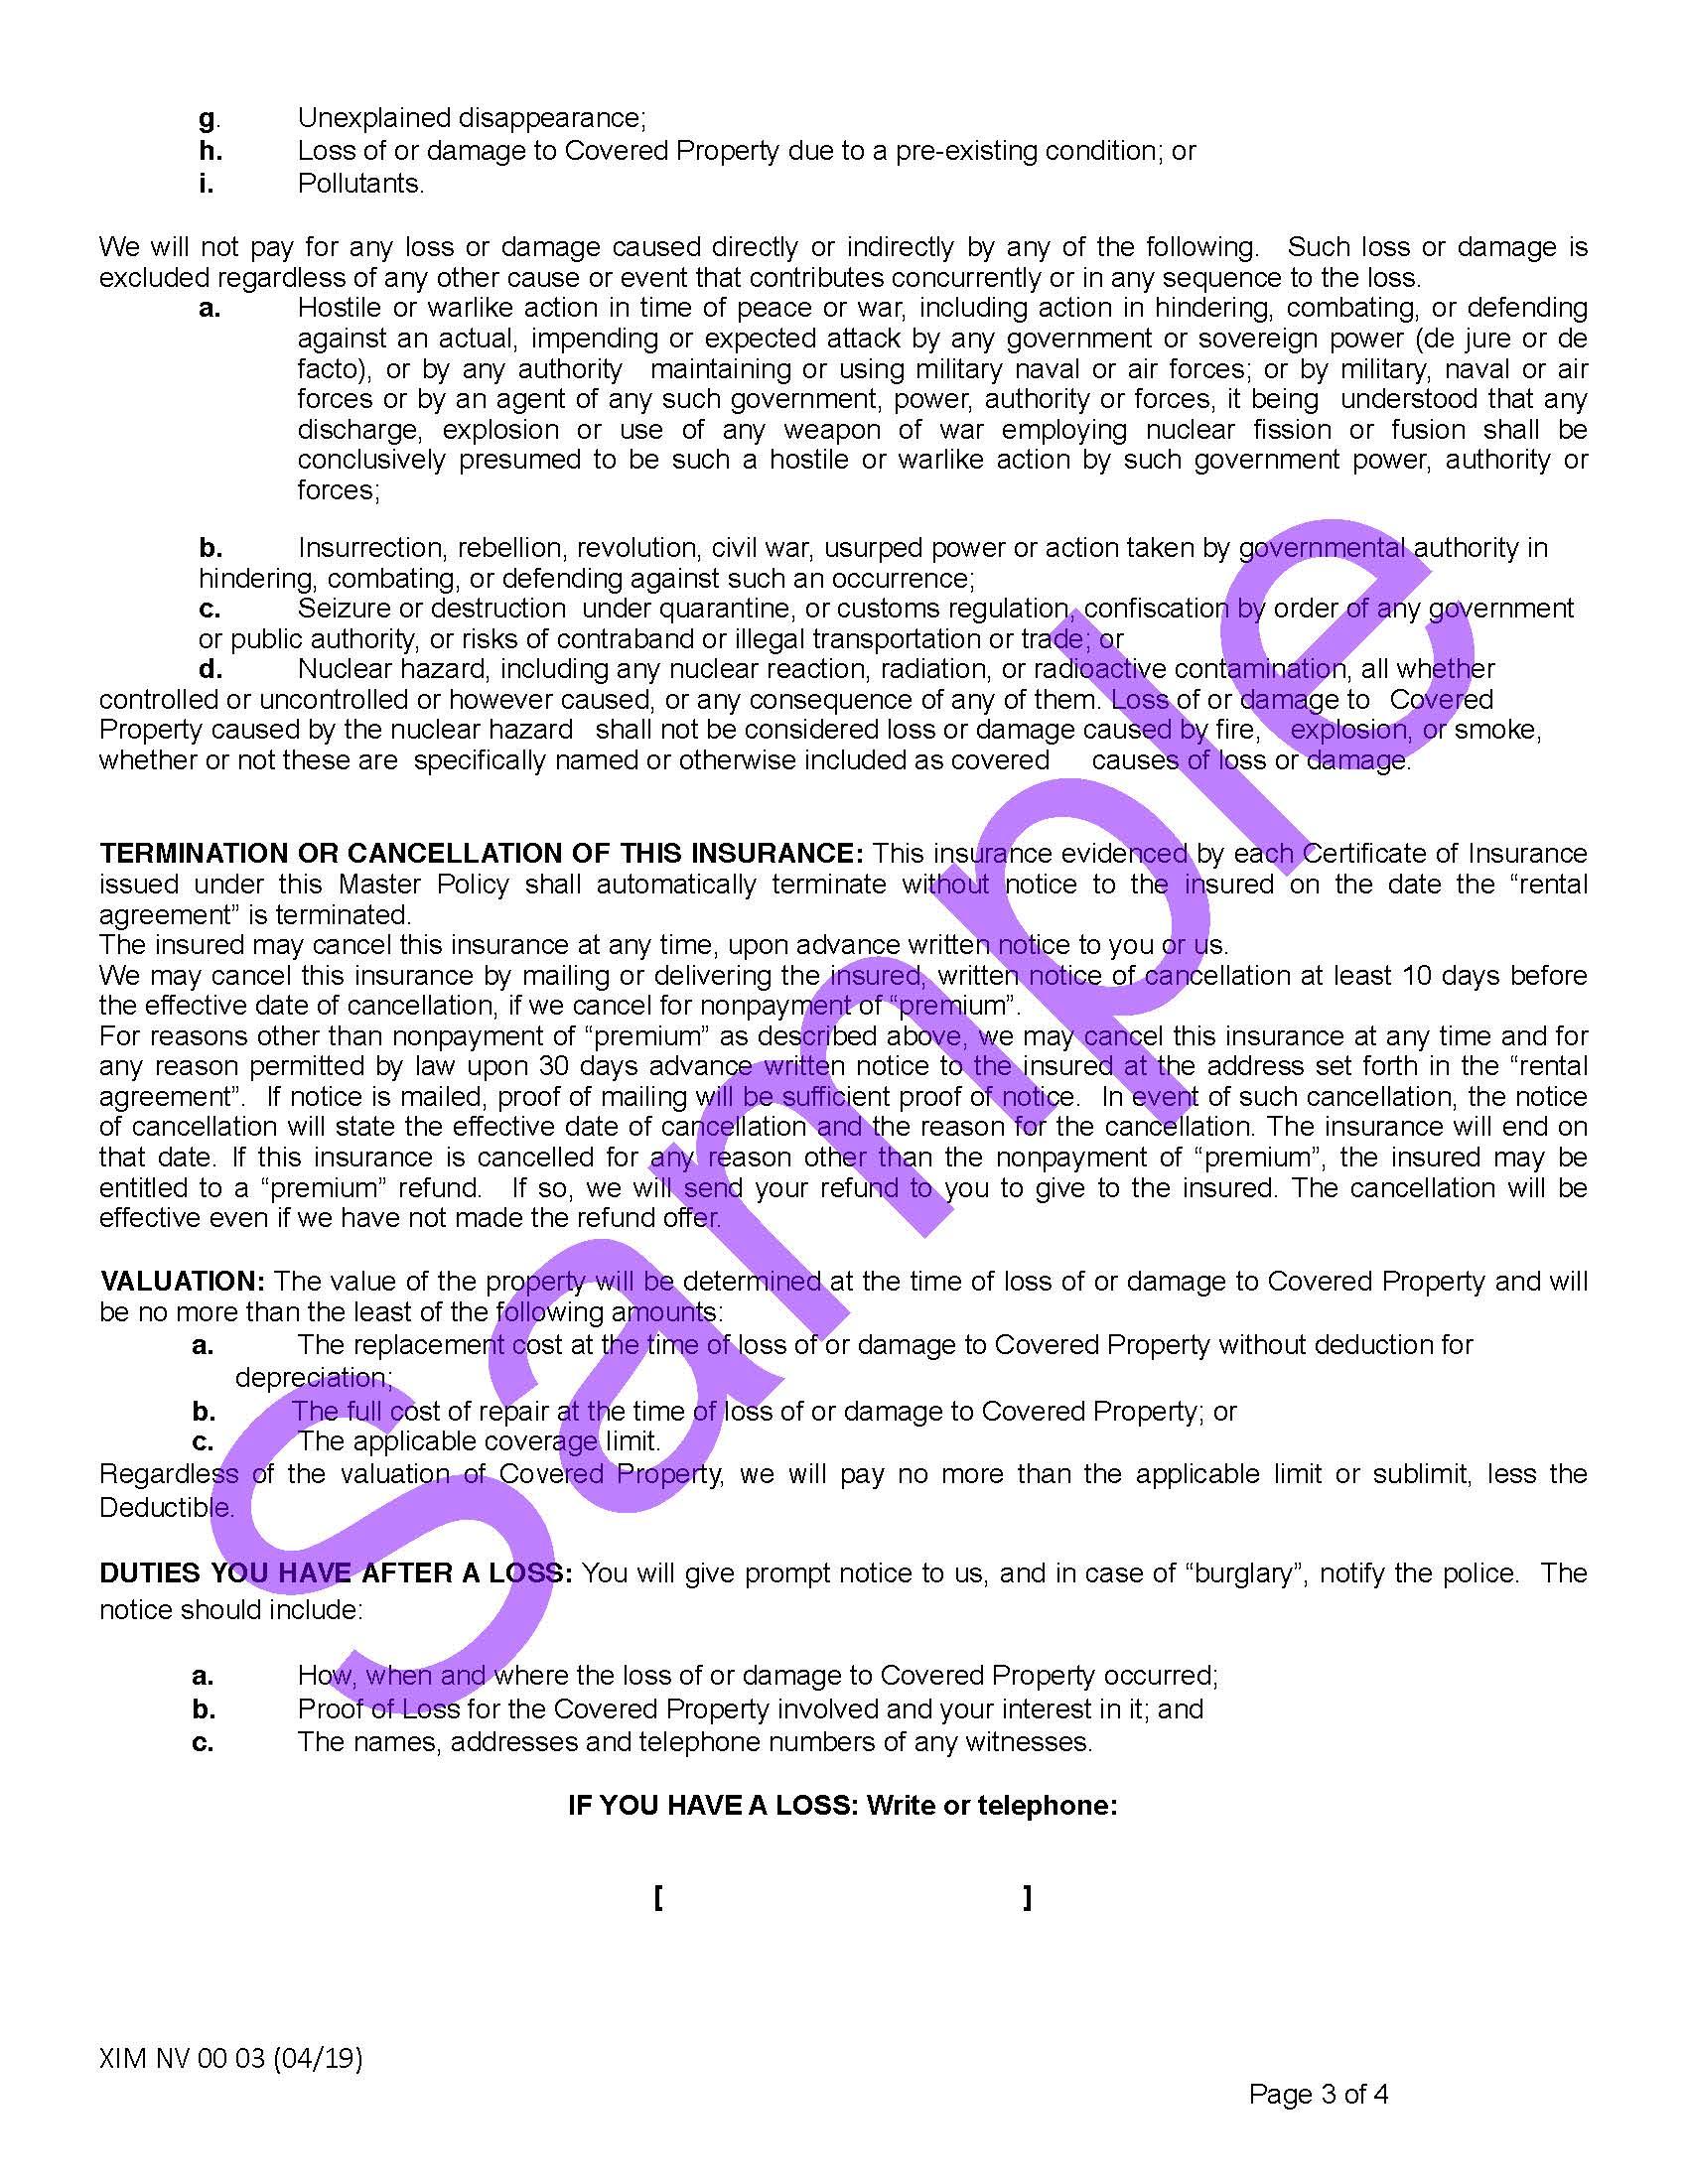 XIM NV 00 03 04 19 Nevada Certificate of InsuranceSample_Page_3.jpg